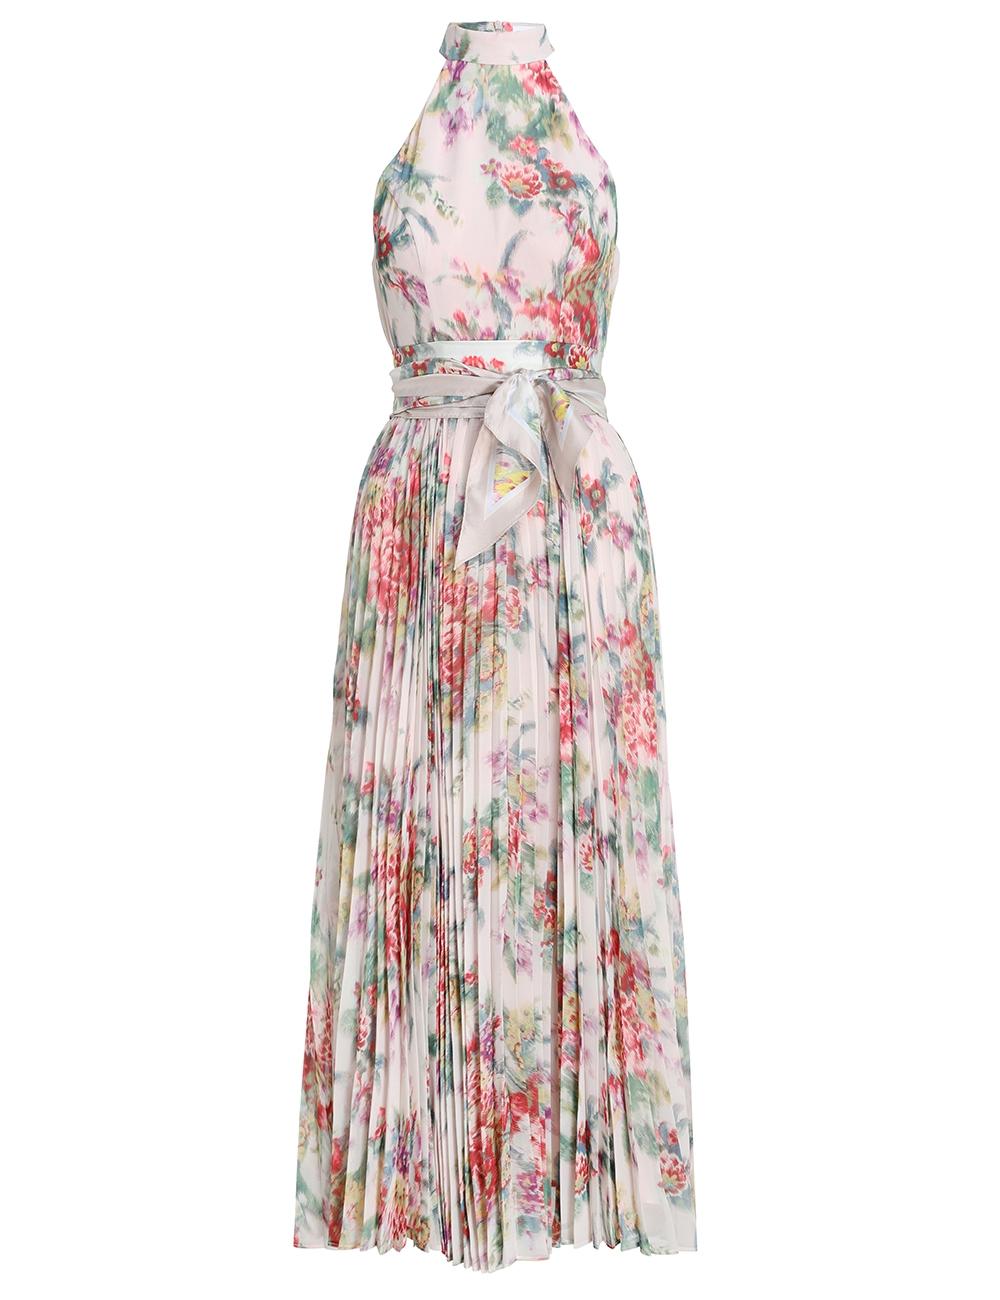 Wavelength Sunray Picnic Dress